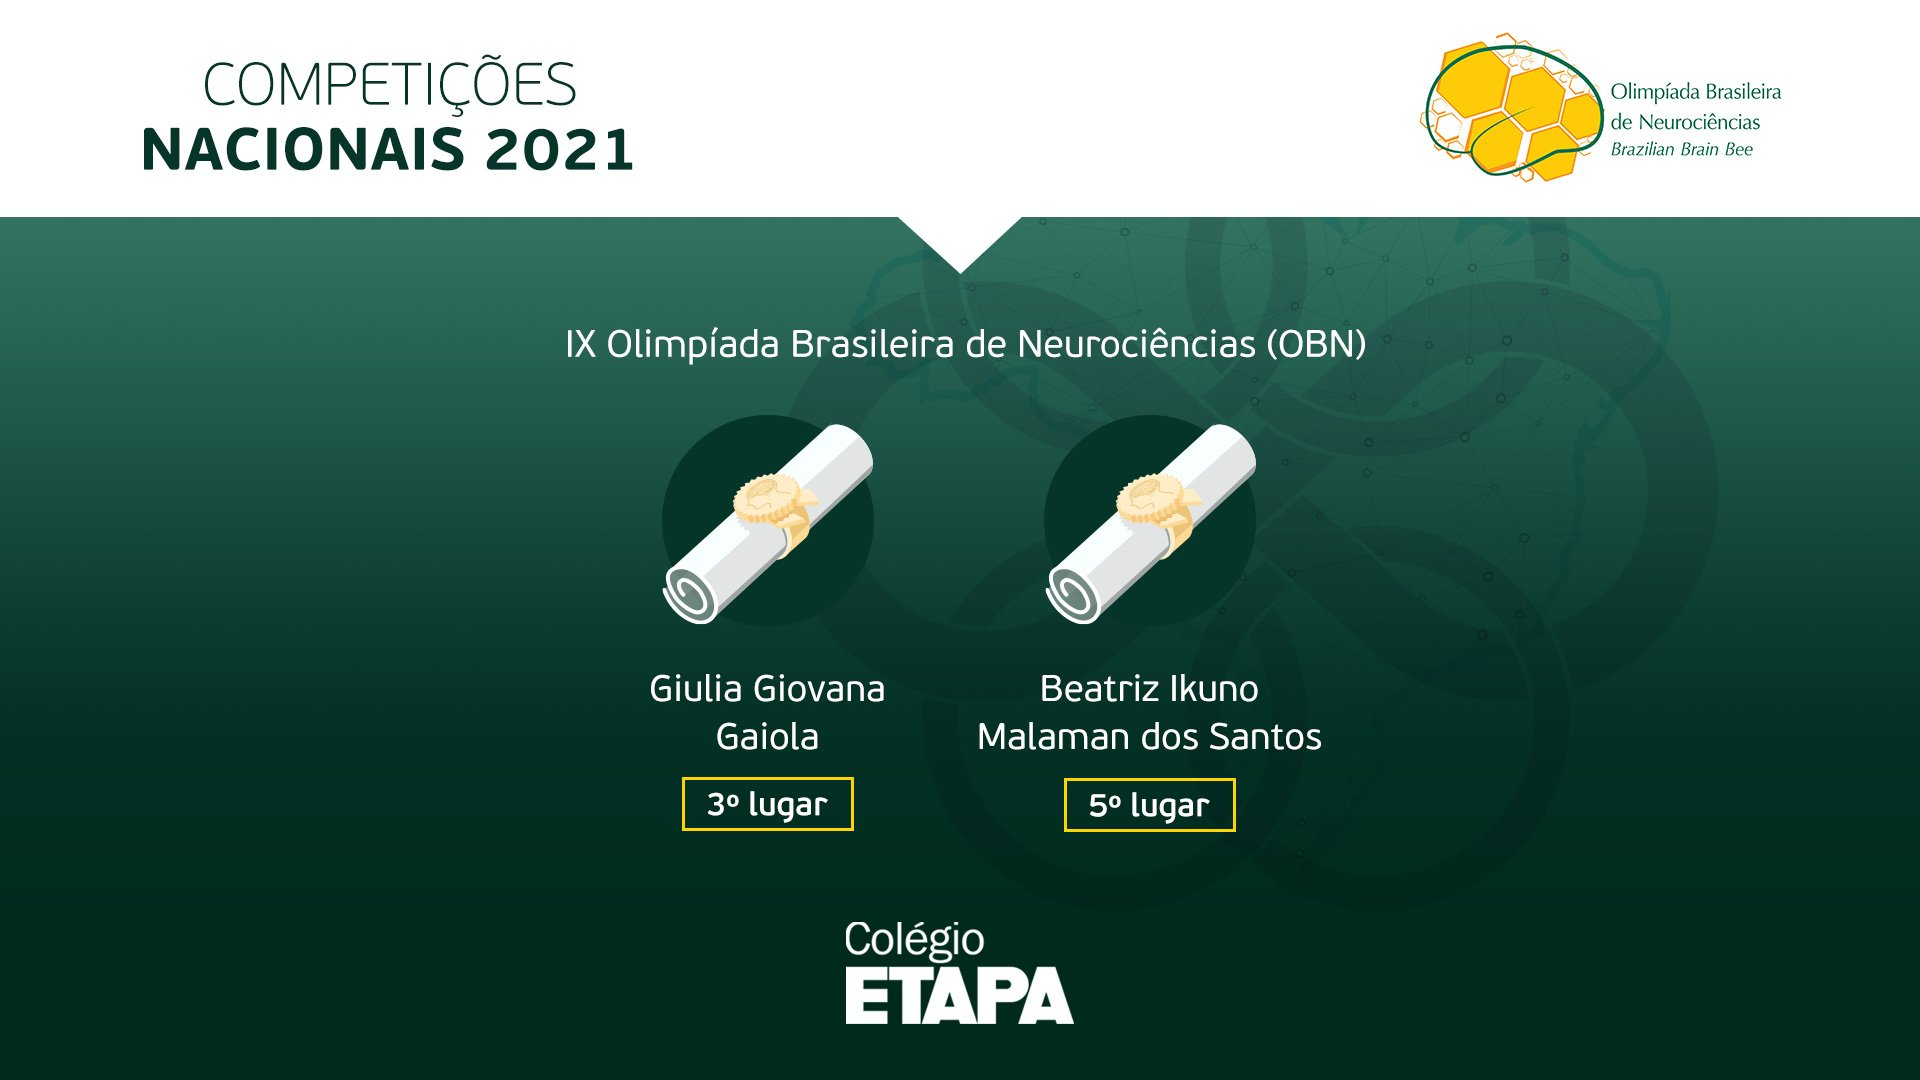 Alunas do Colégio Etapa são premiadas na OBN 2021